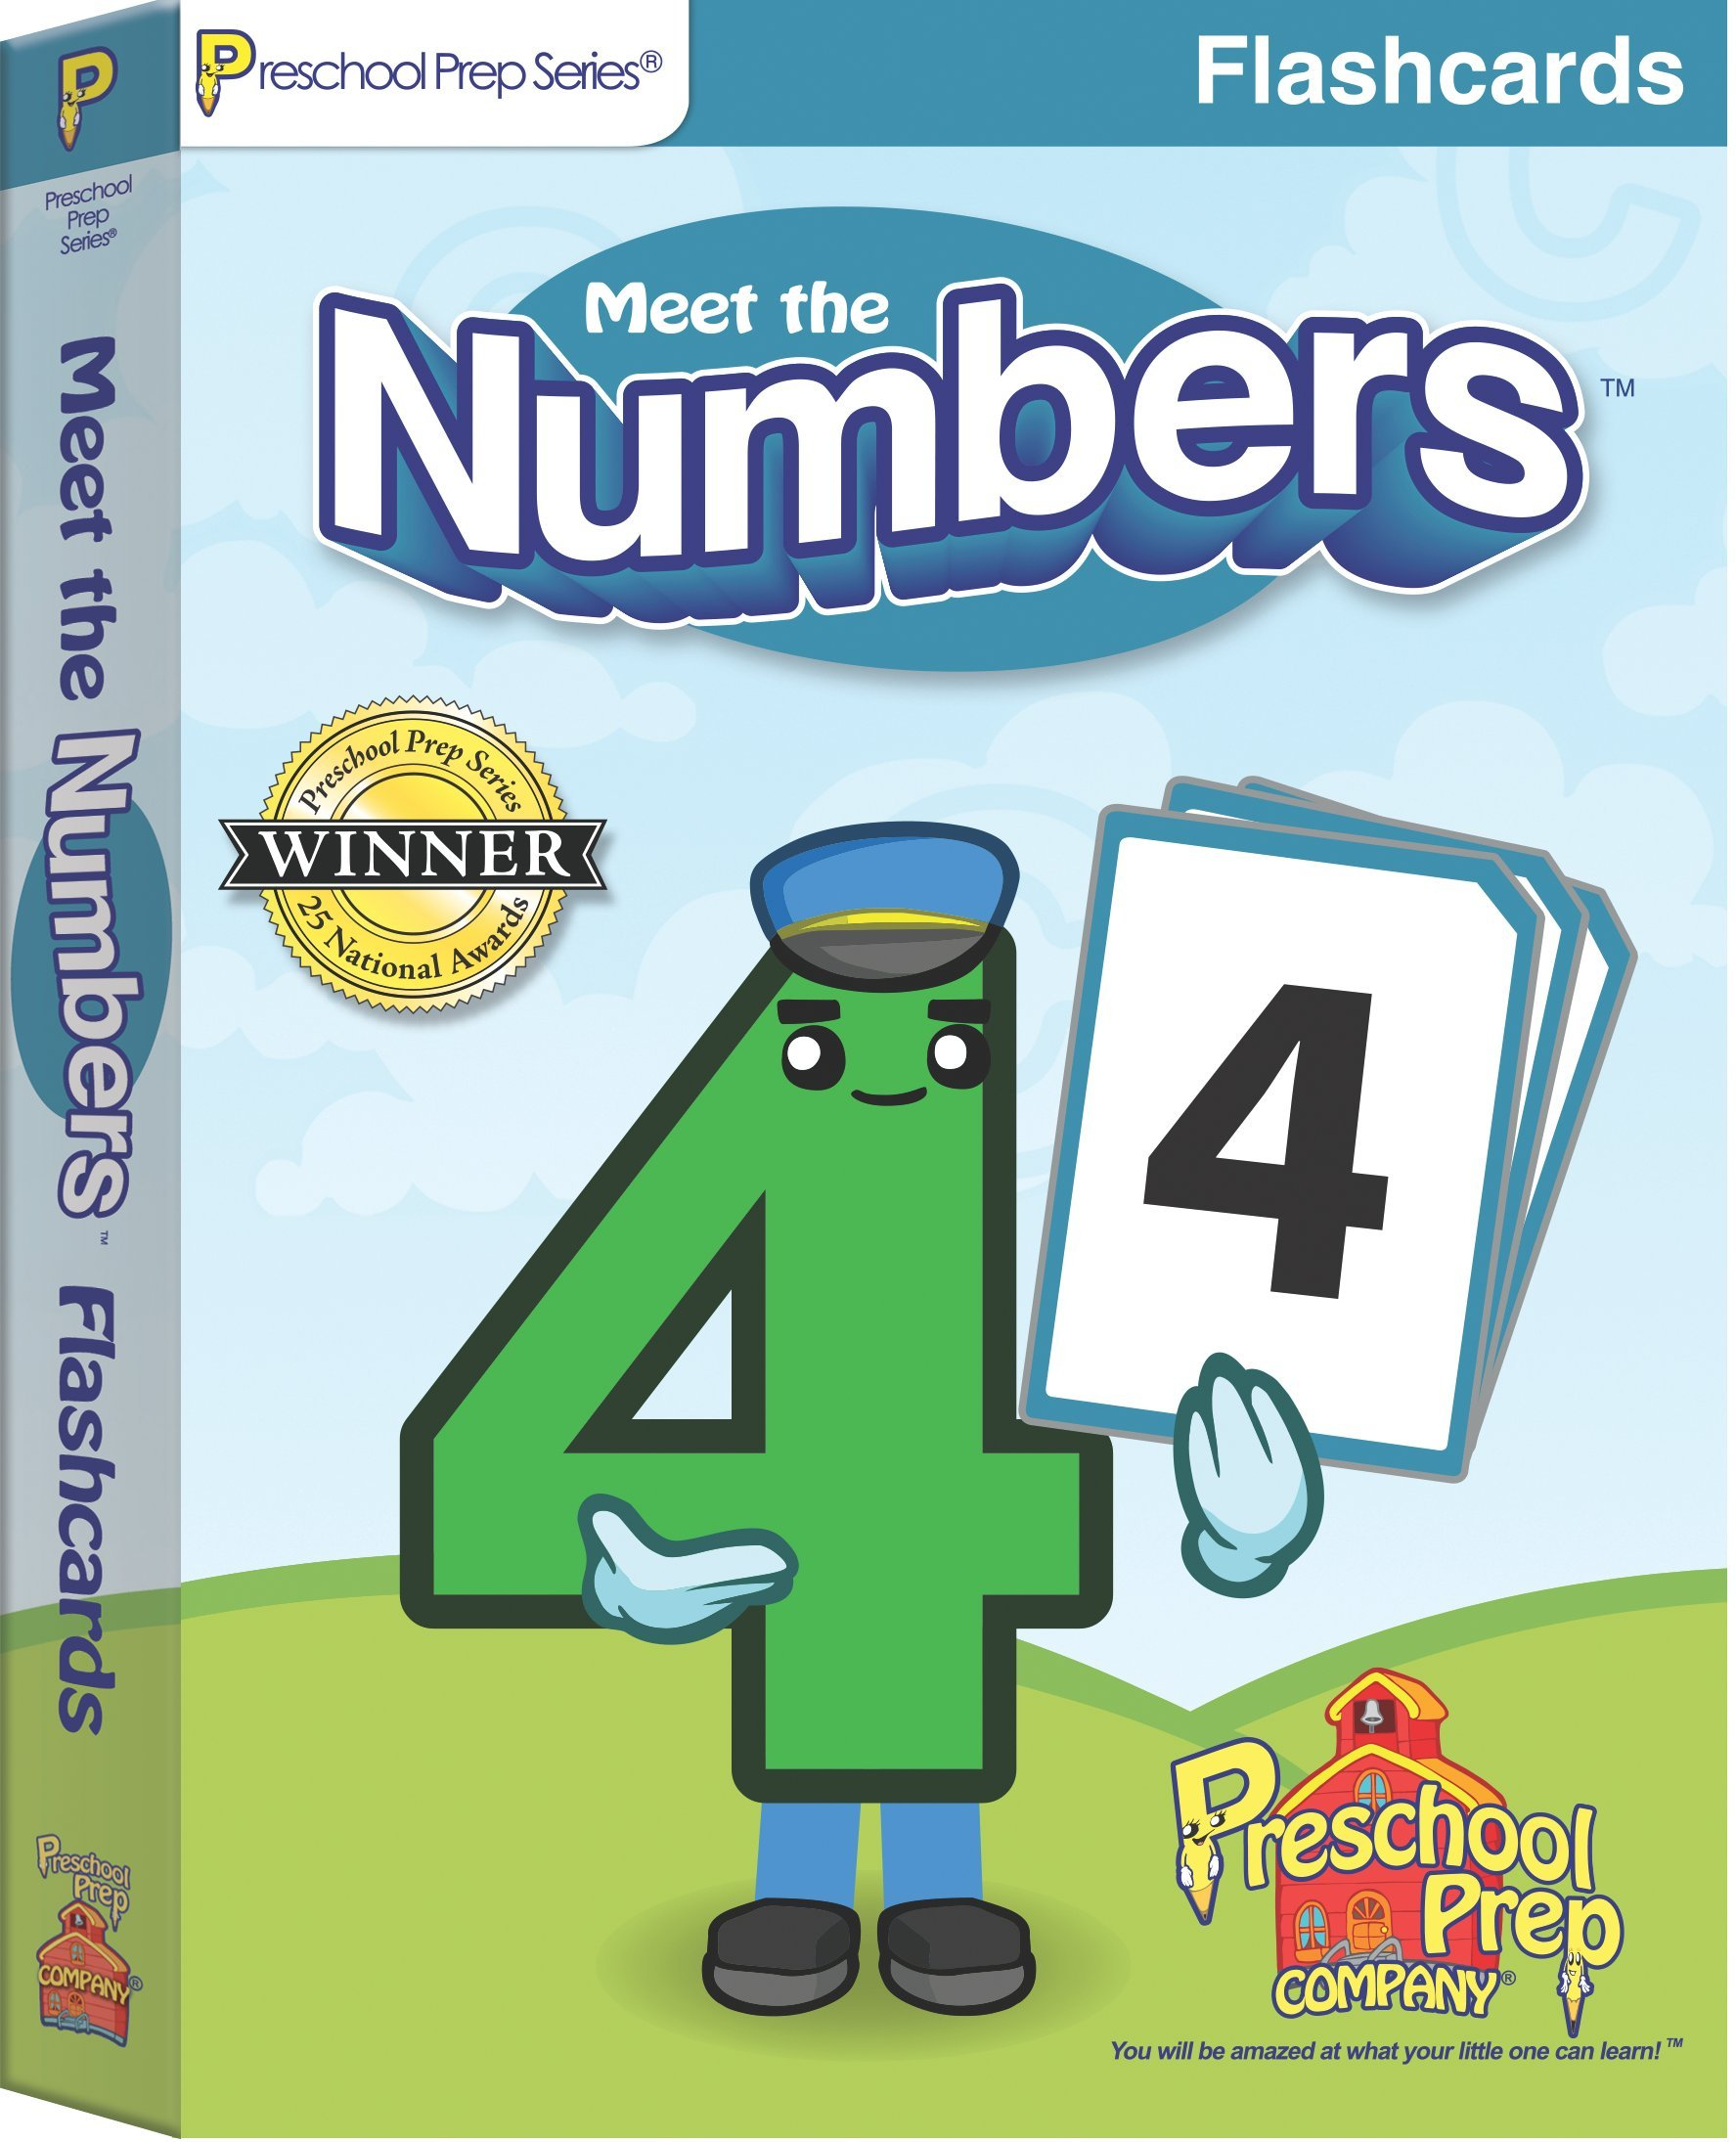 Meet the Numbers - Flashcards: Kathy Oxley: 9781935610359: Amazon ...